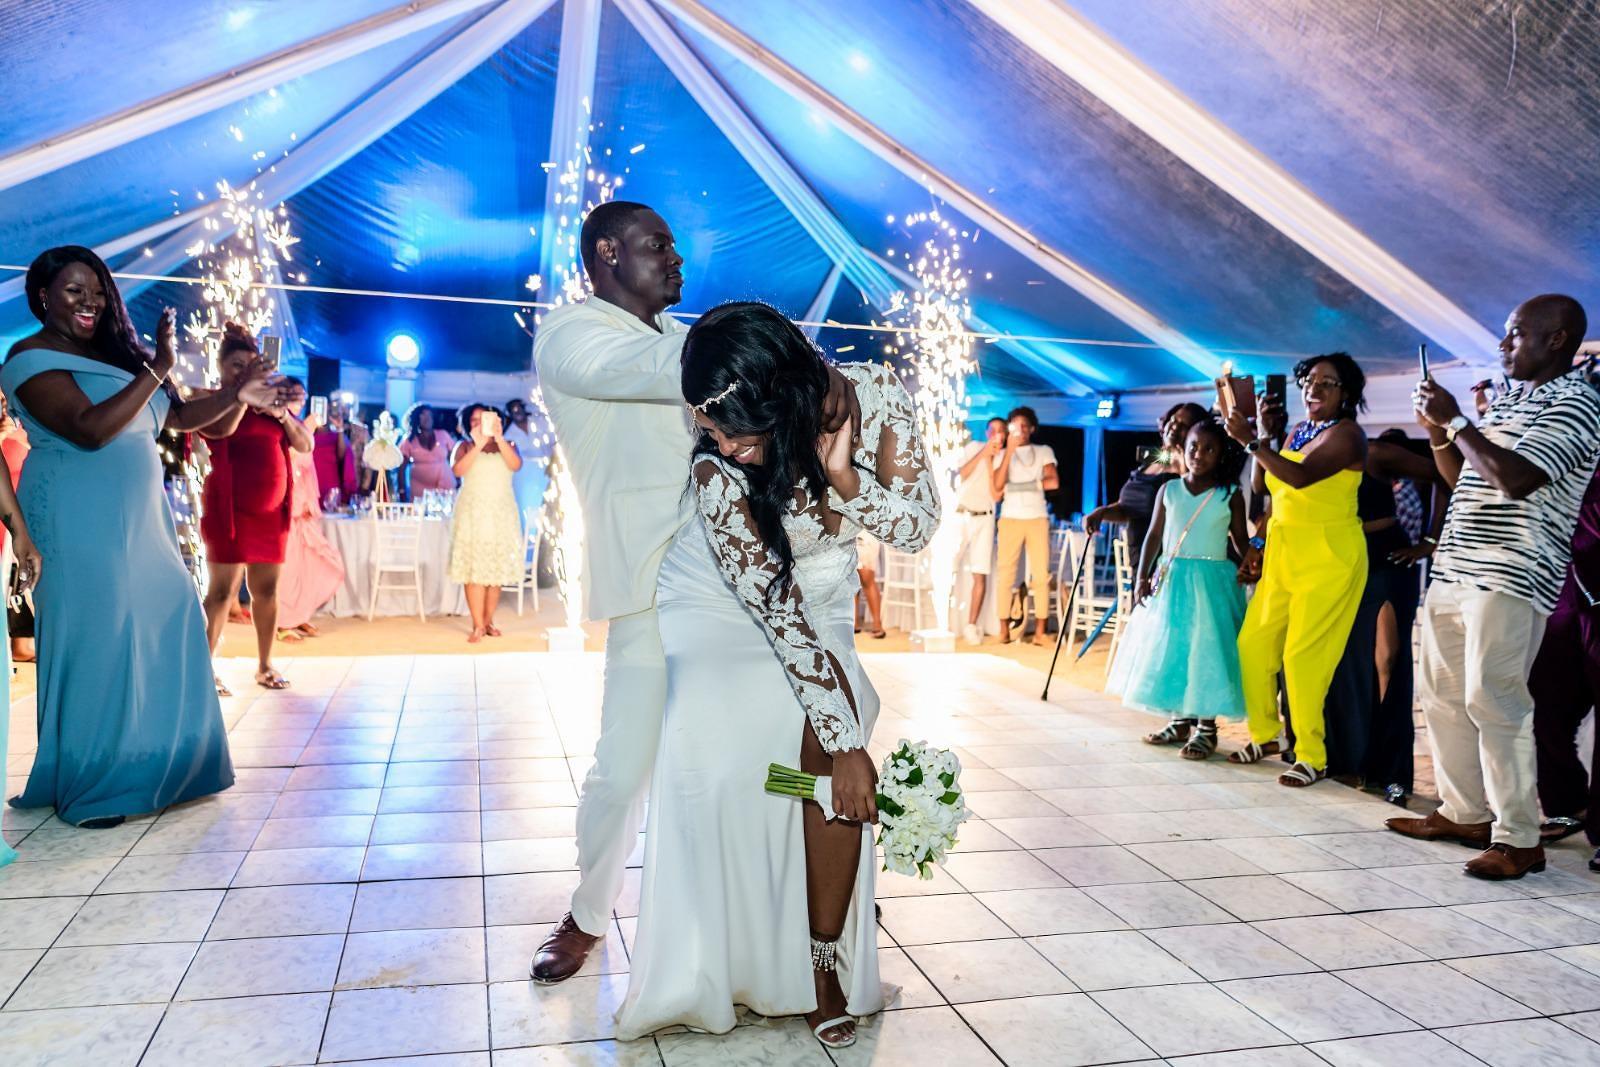 Wedding Reception at Beaches Negril Resort, 7 Mile Strip Negril Jamaica